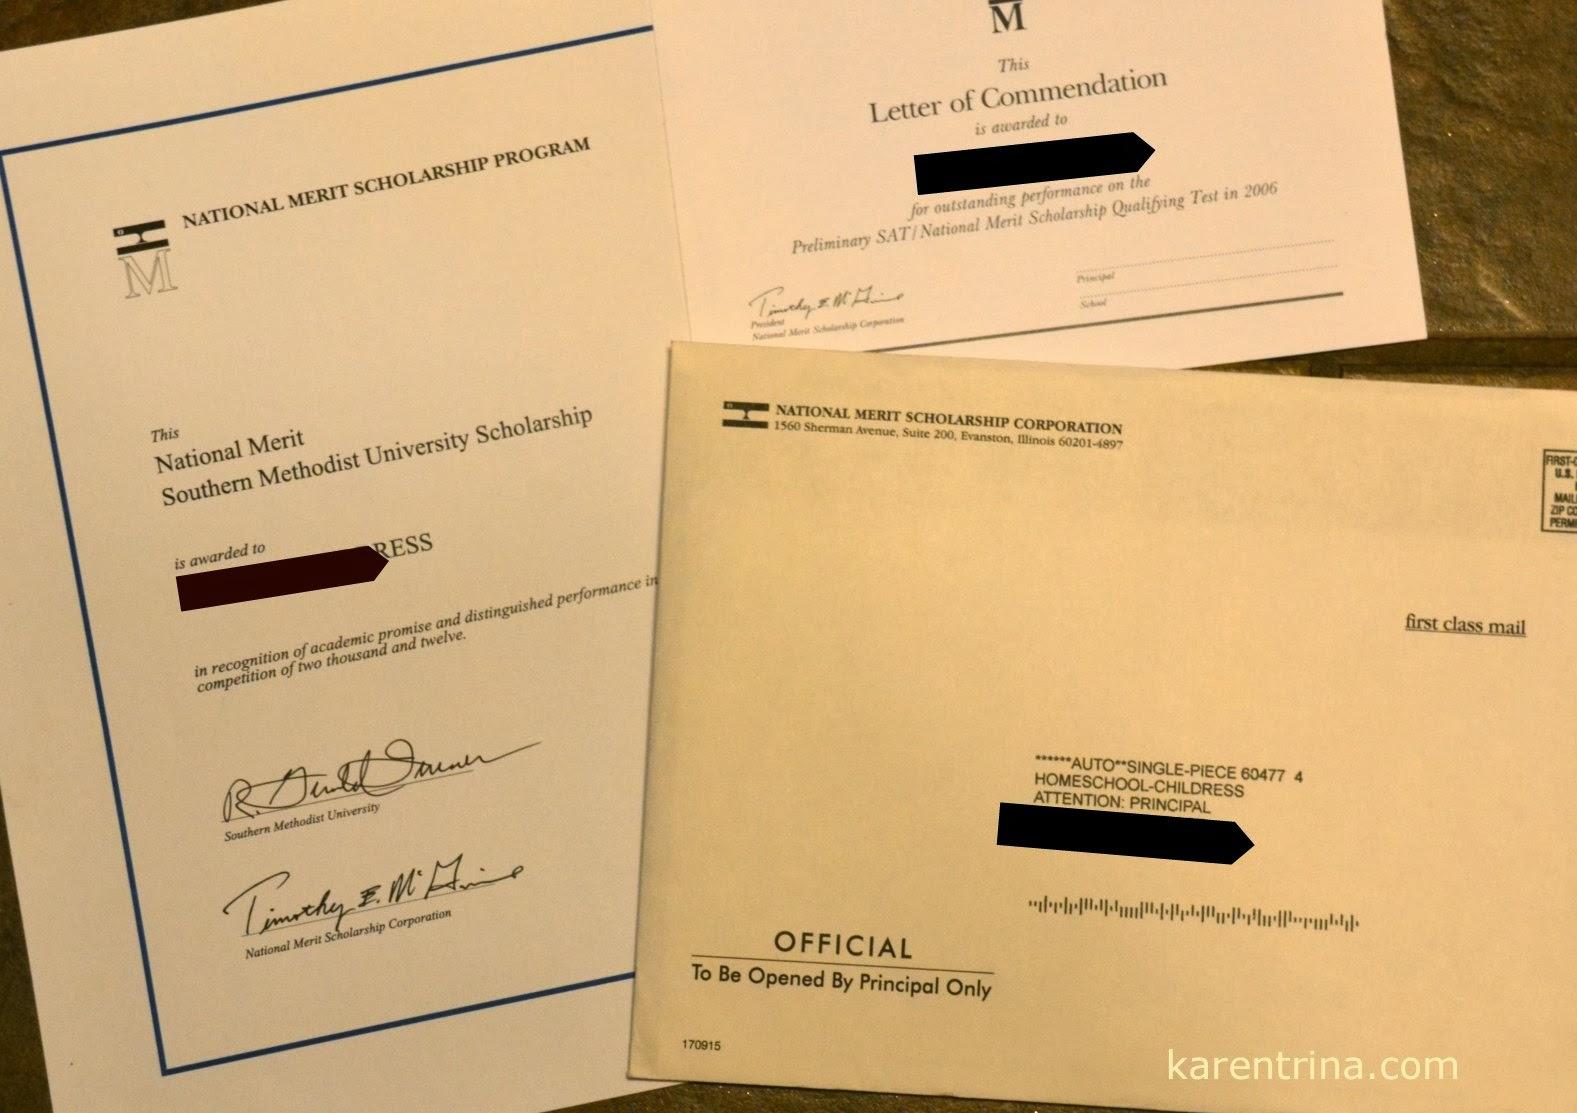 National Merit Scholarship questions